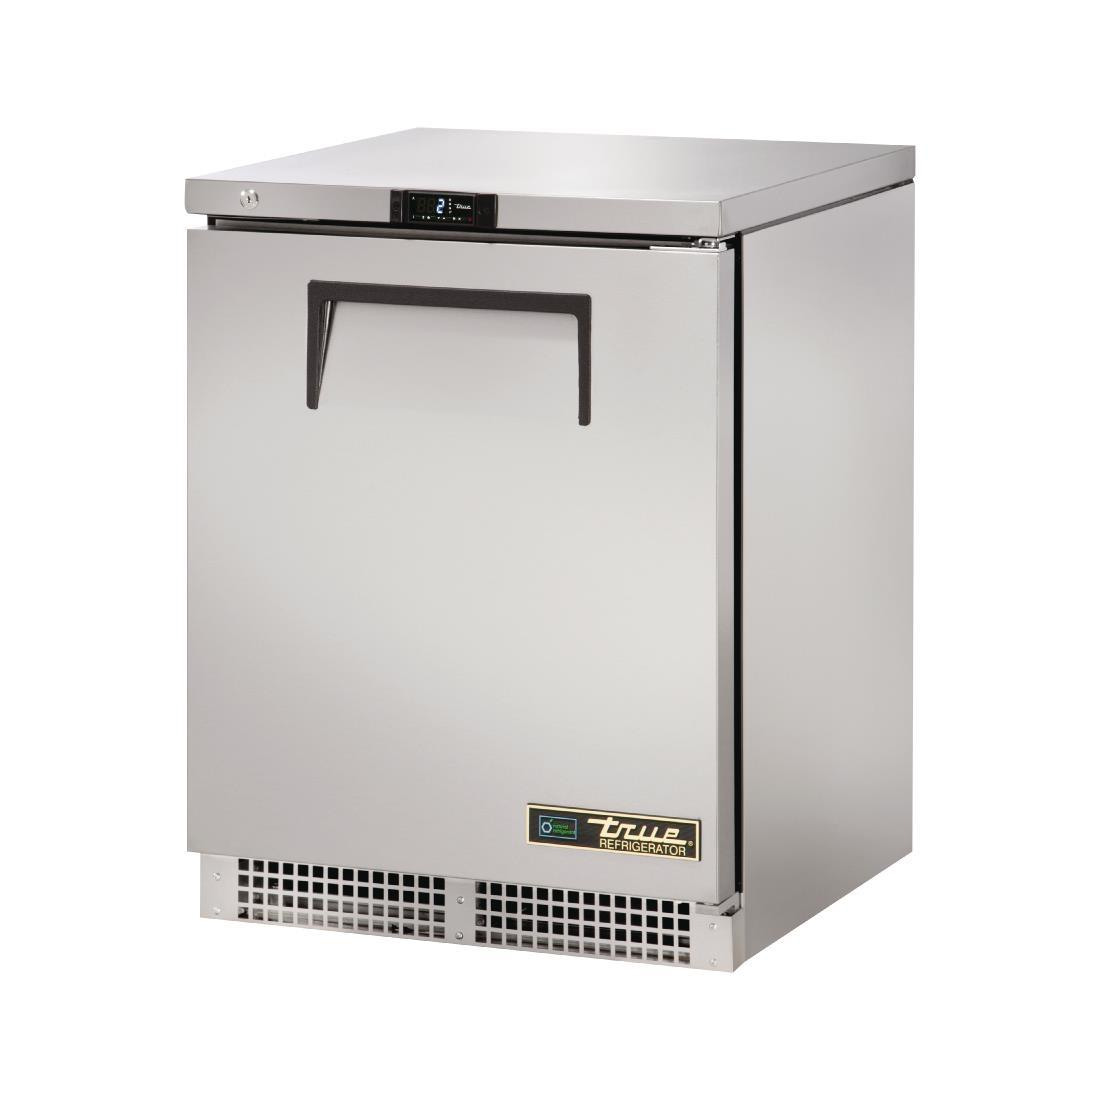 Mostrador frigorífico 147 litros True CC665